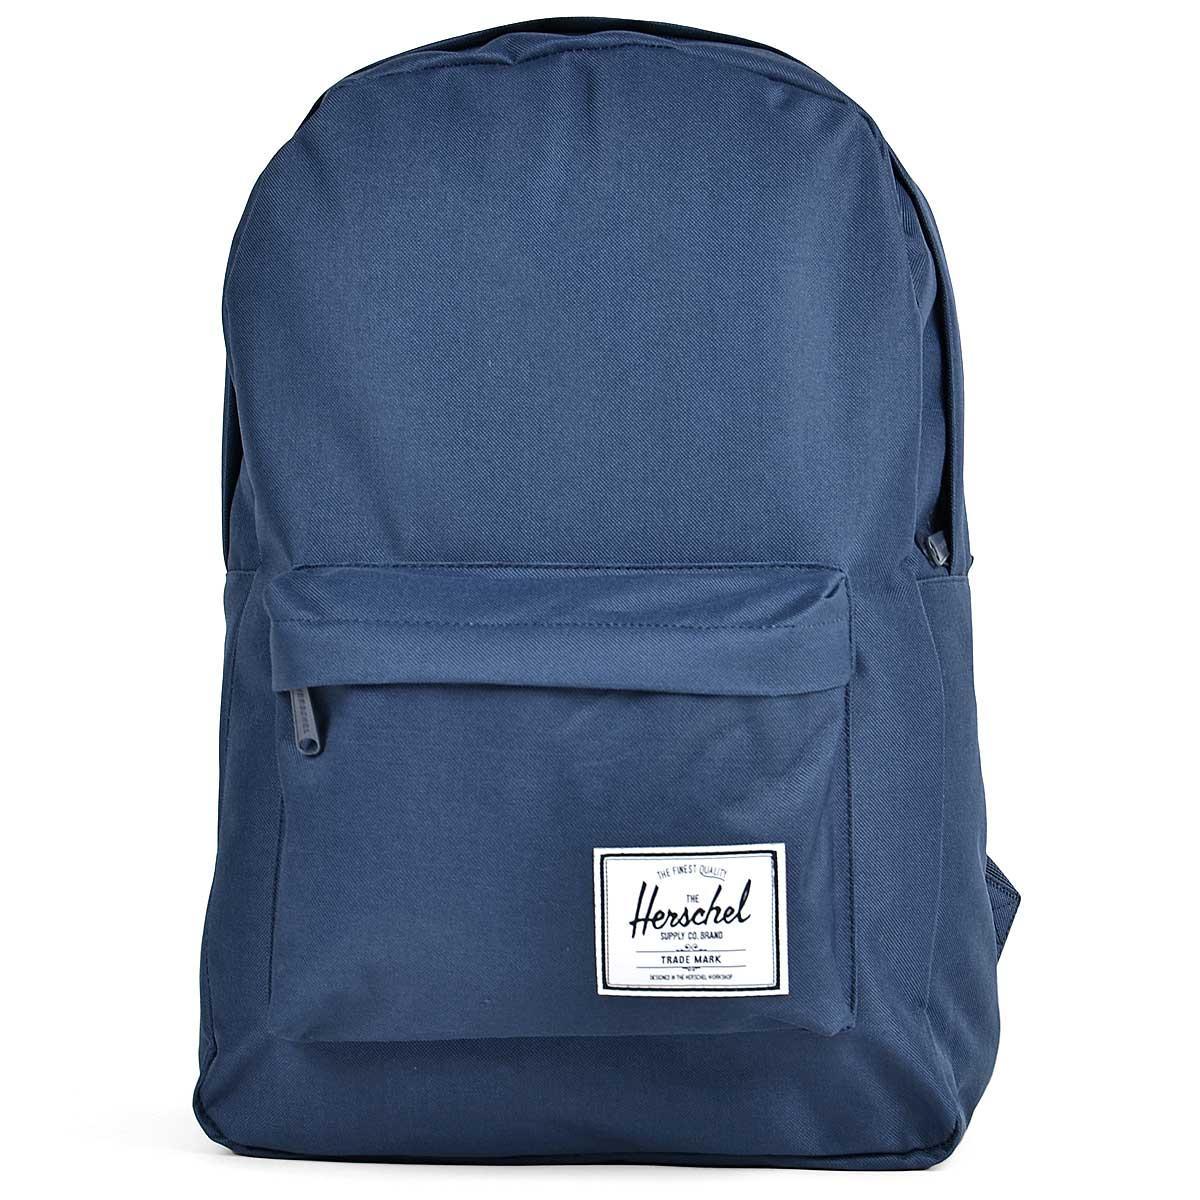 00ba1fcba Buy Herschel Supply Co | Backpacks | Lazada.sg